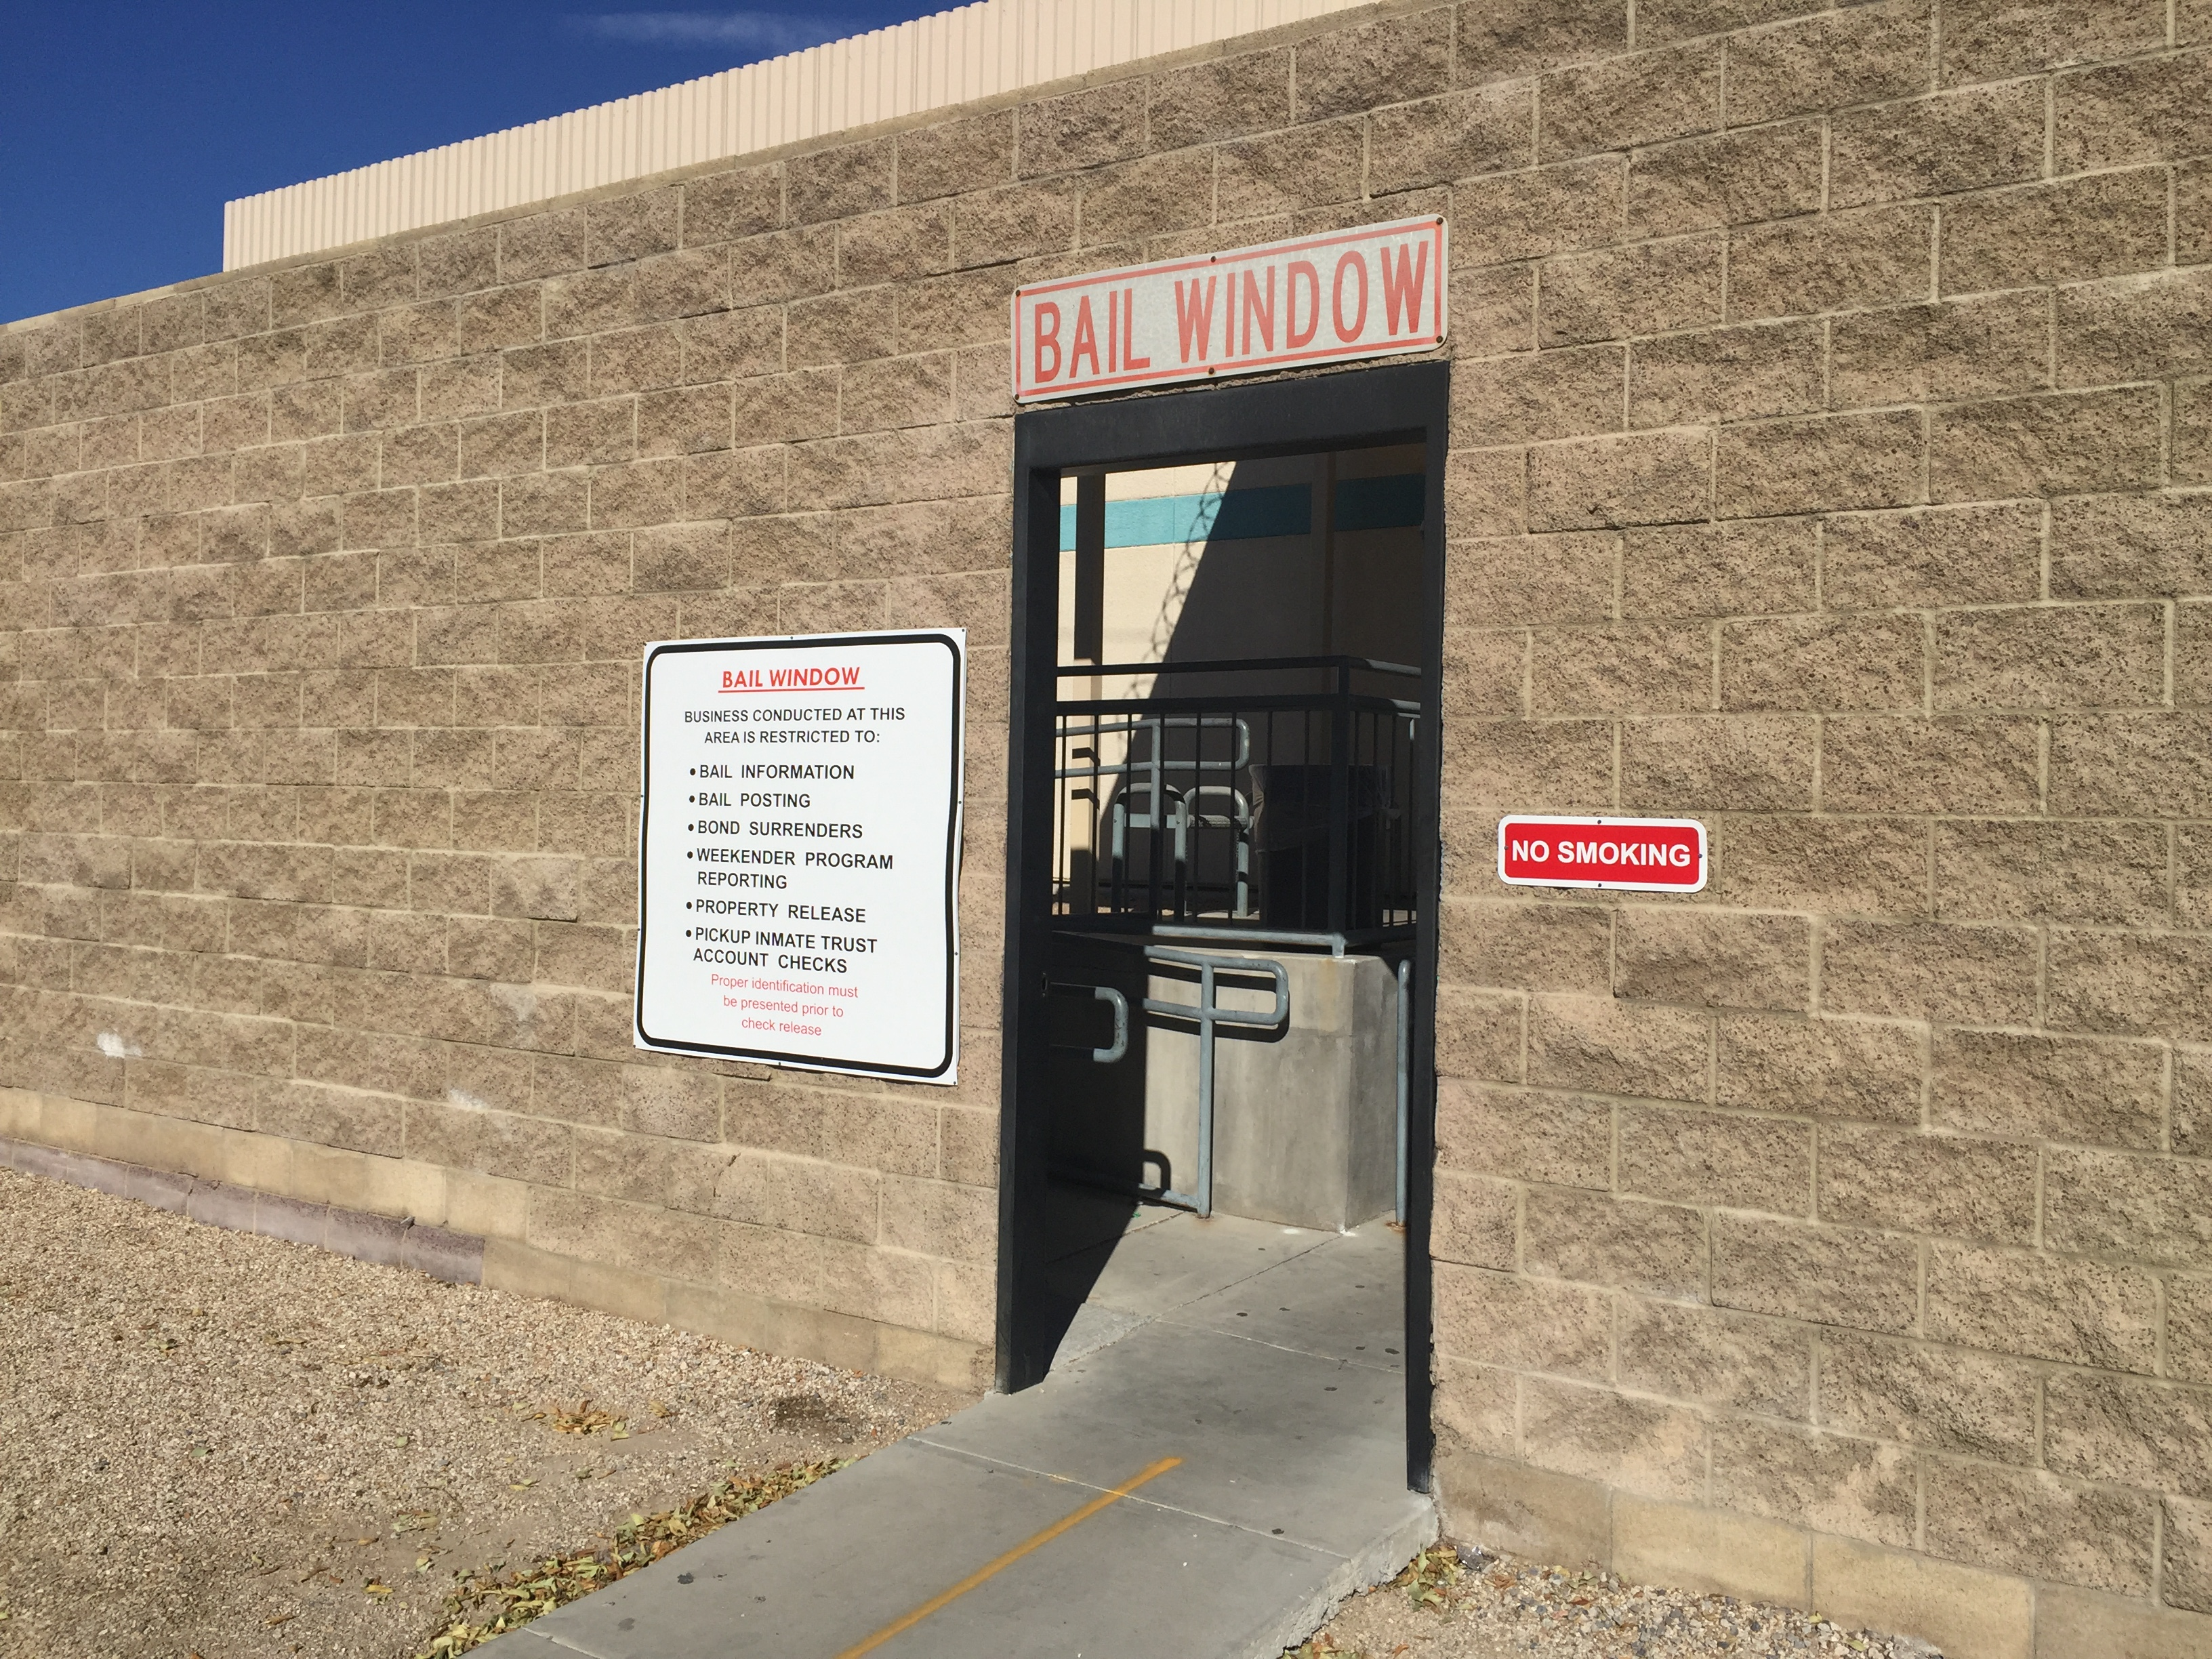 North Las Vegas Jail Inmate Search